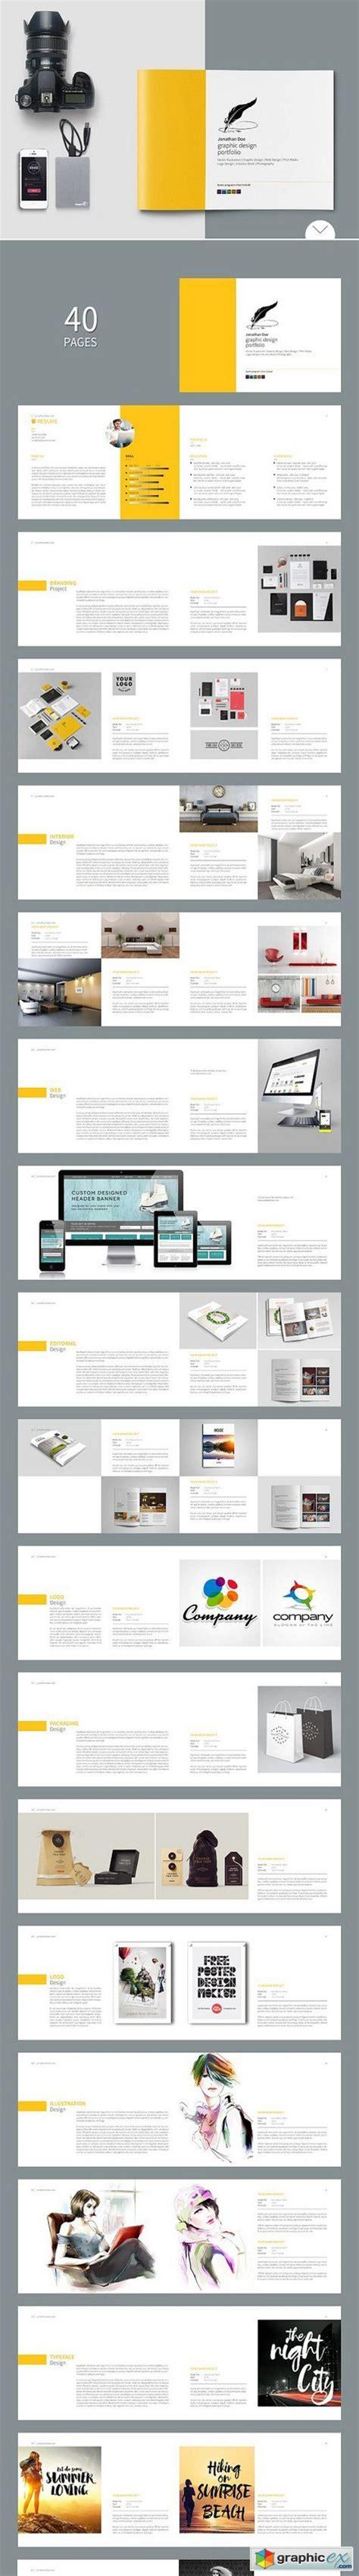 graphic design portfolio template 998430 187 free download